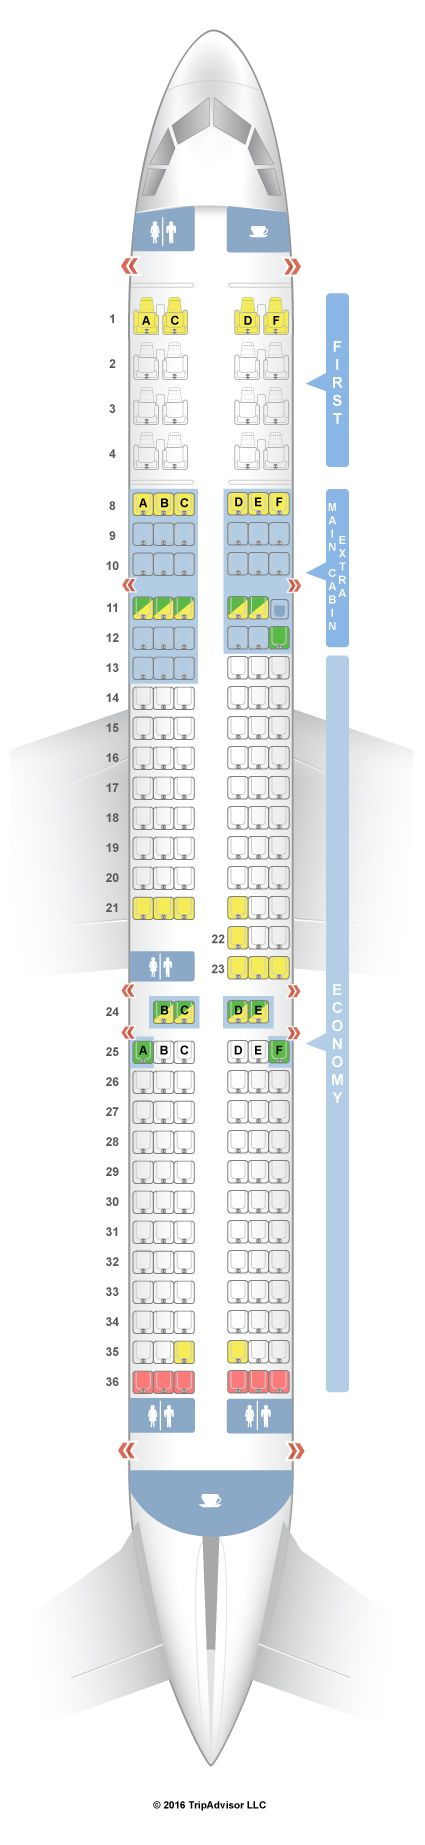 Seatguru Seat Map American Airlines Airbus A321 32b V2